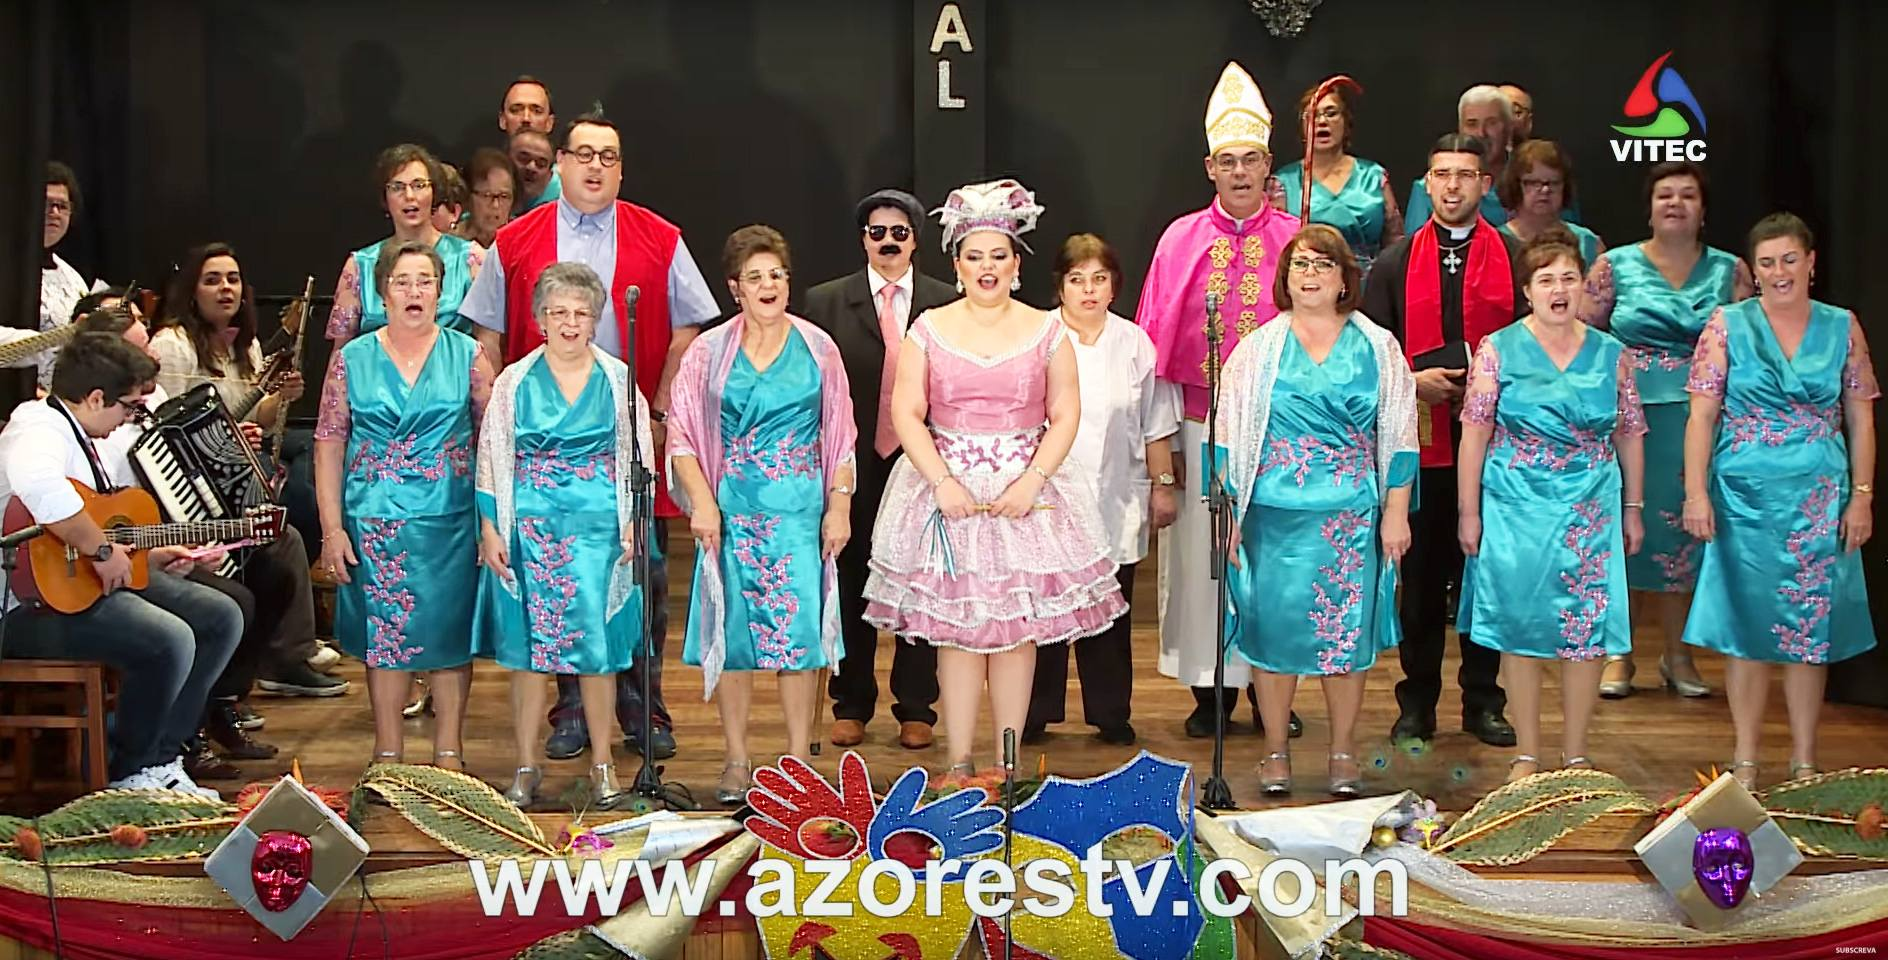 Carnaval Sénior na VITEC